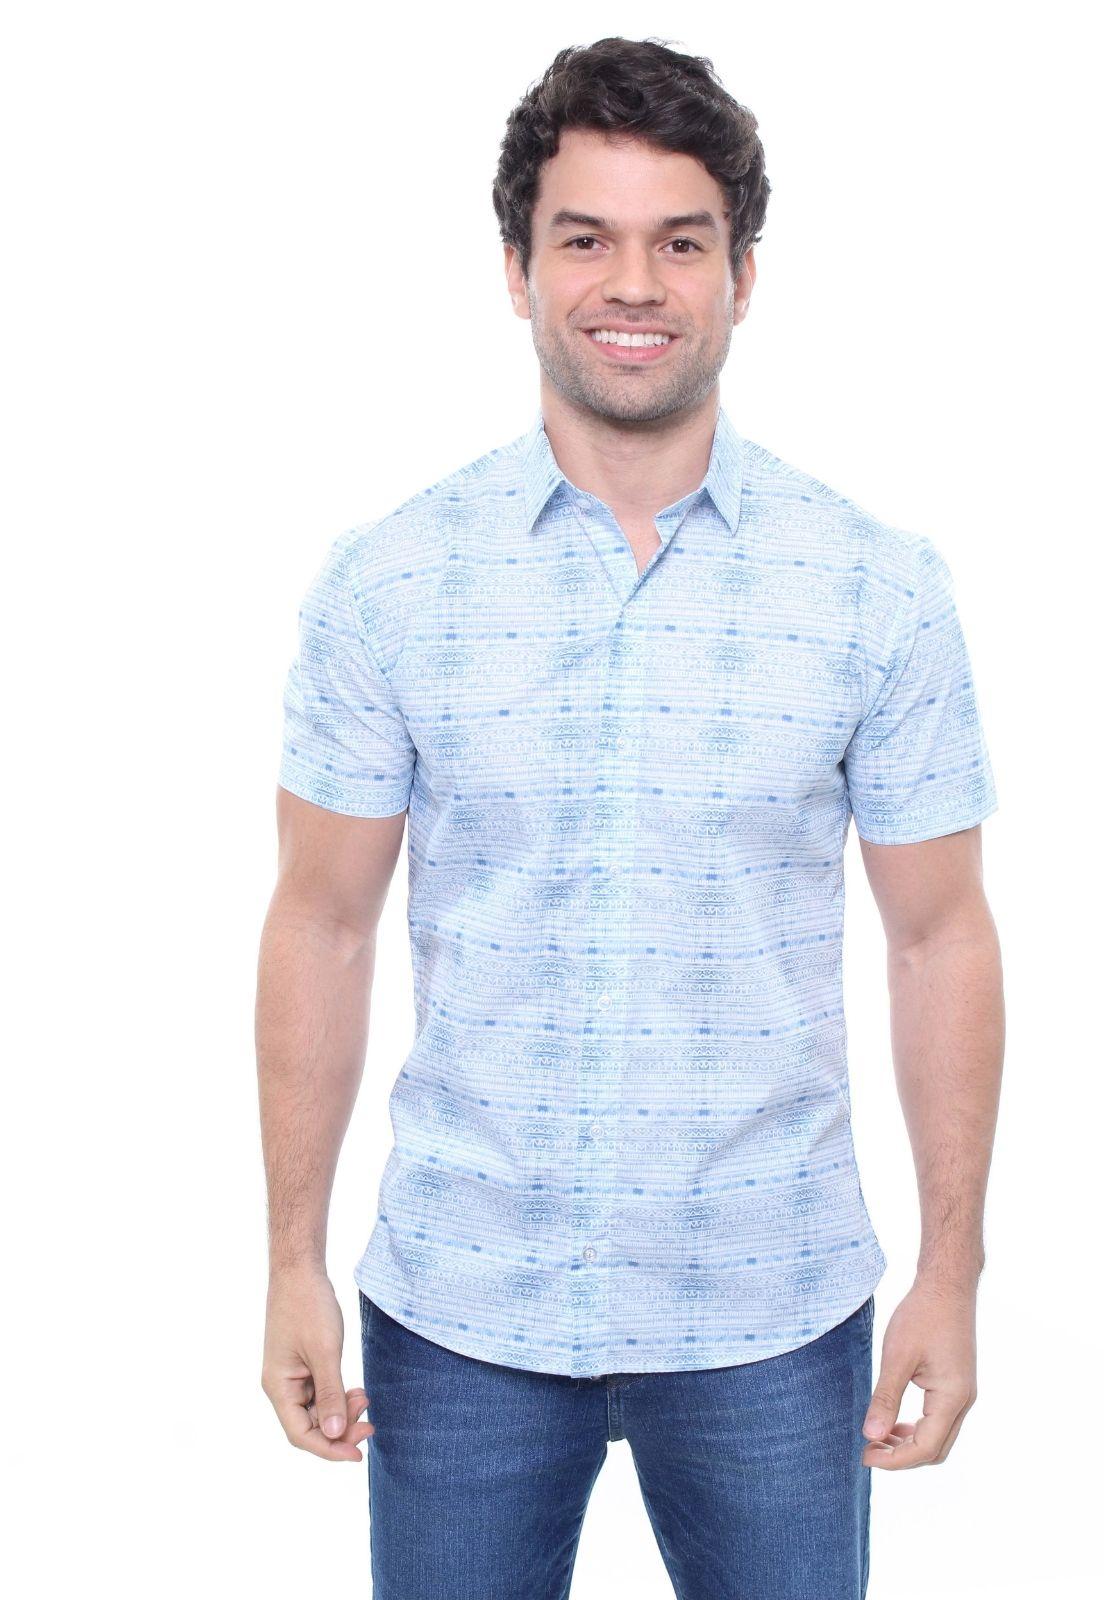 Camisa Estampada Masculina Manga Curta Crocker -  47827  - CROCKER JEANS